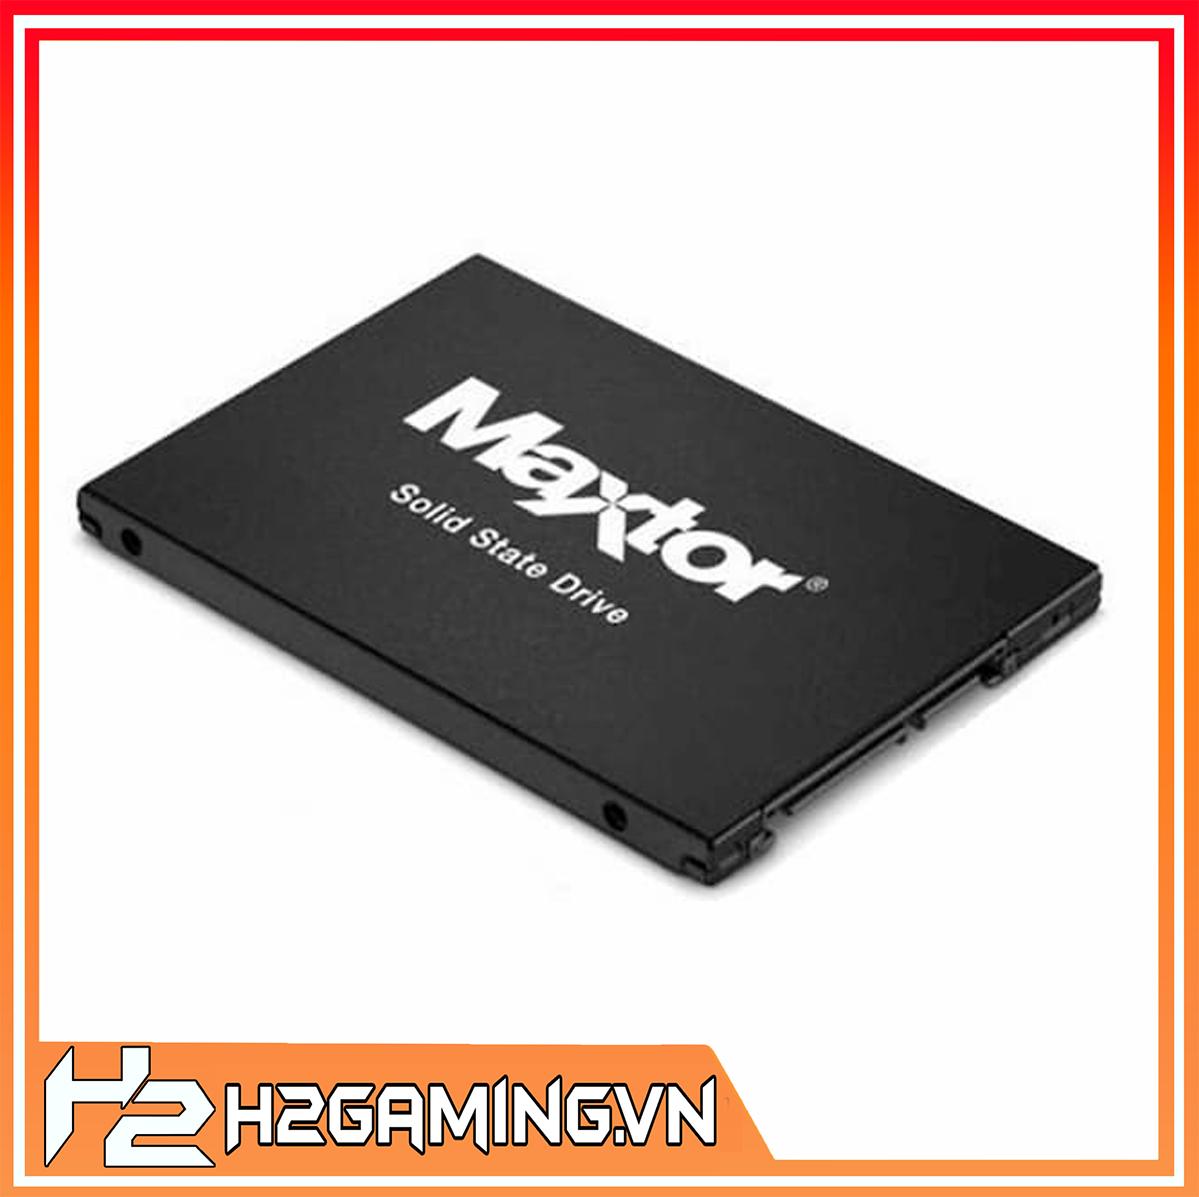 SSD_Seagate_Maxtor_Z1_240GB